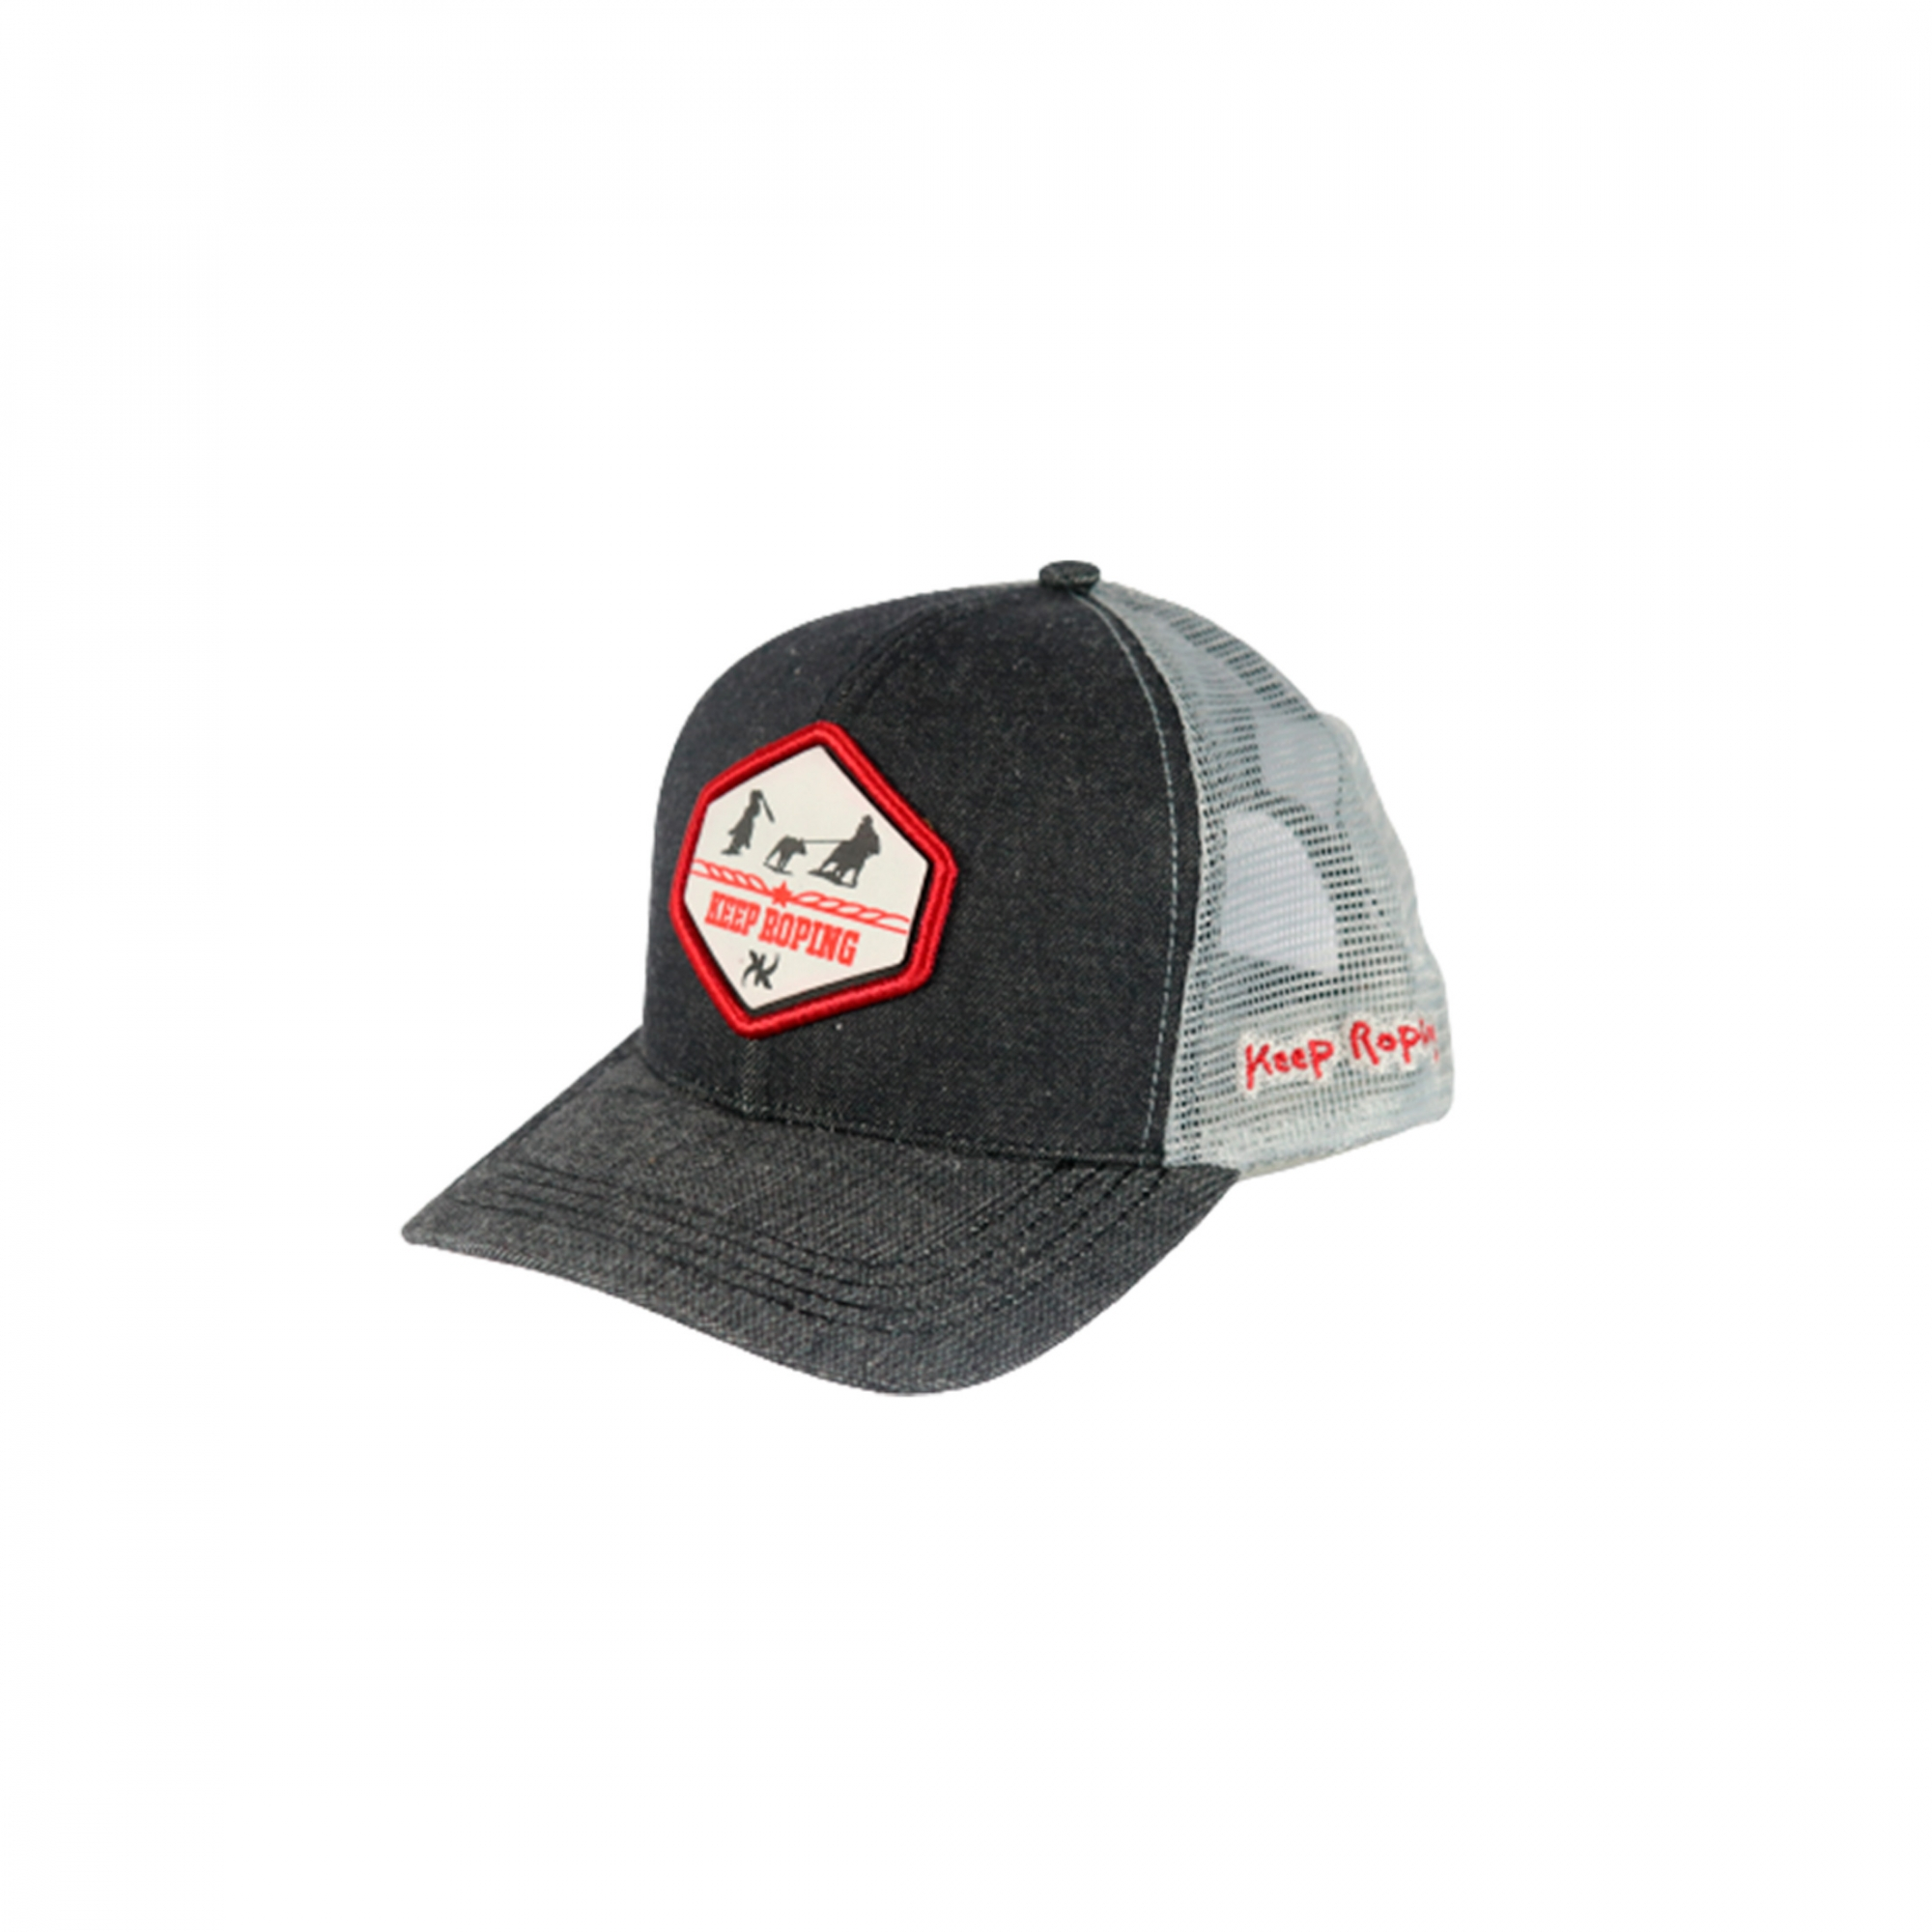 Boné Keep Roping Trucker Hat com aba curva Jeans/Branco